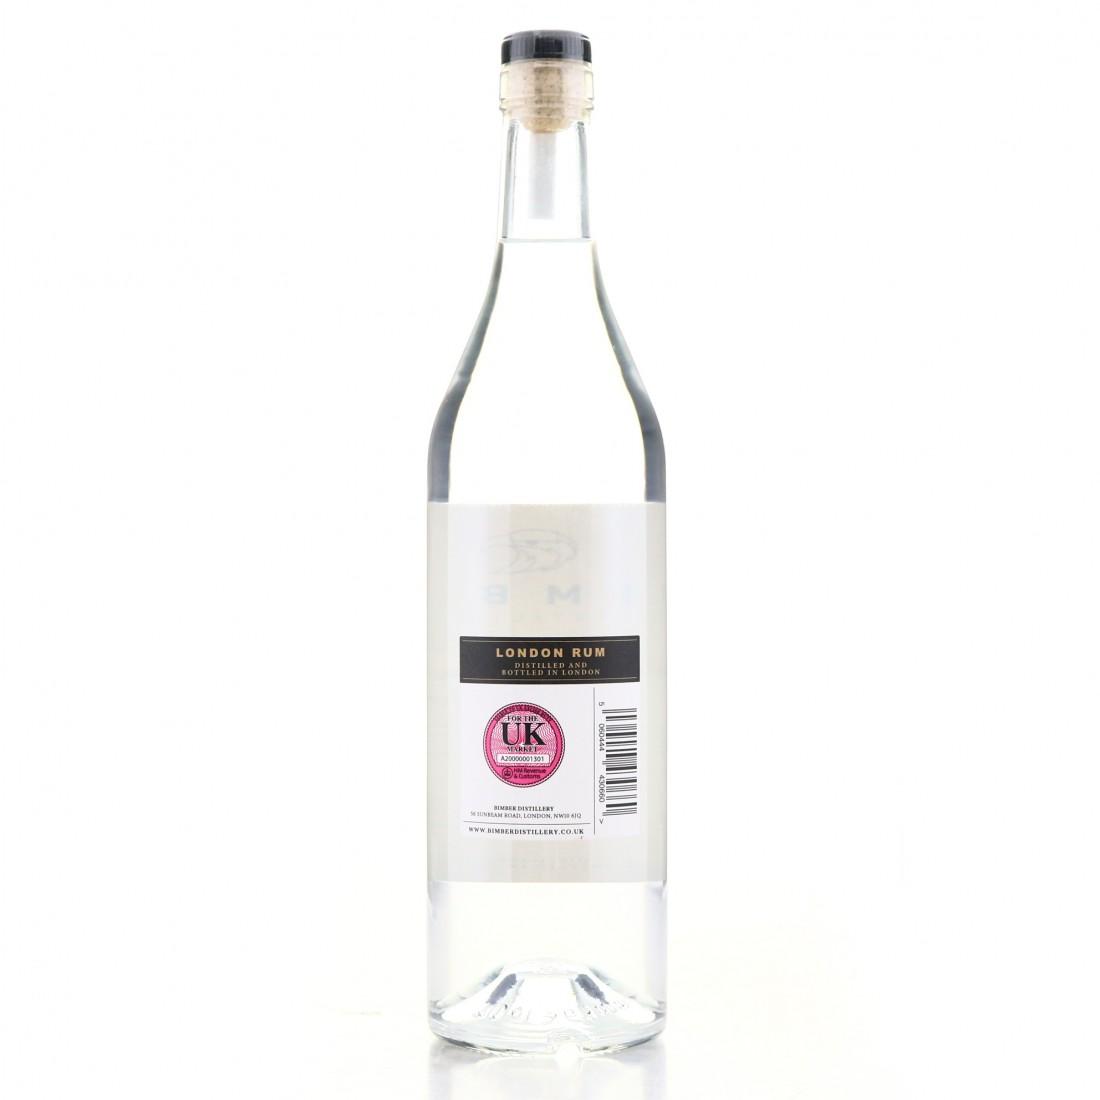 Bimber London Rum Batch #002